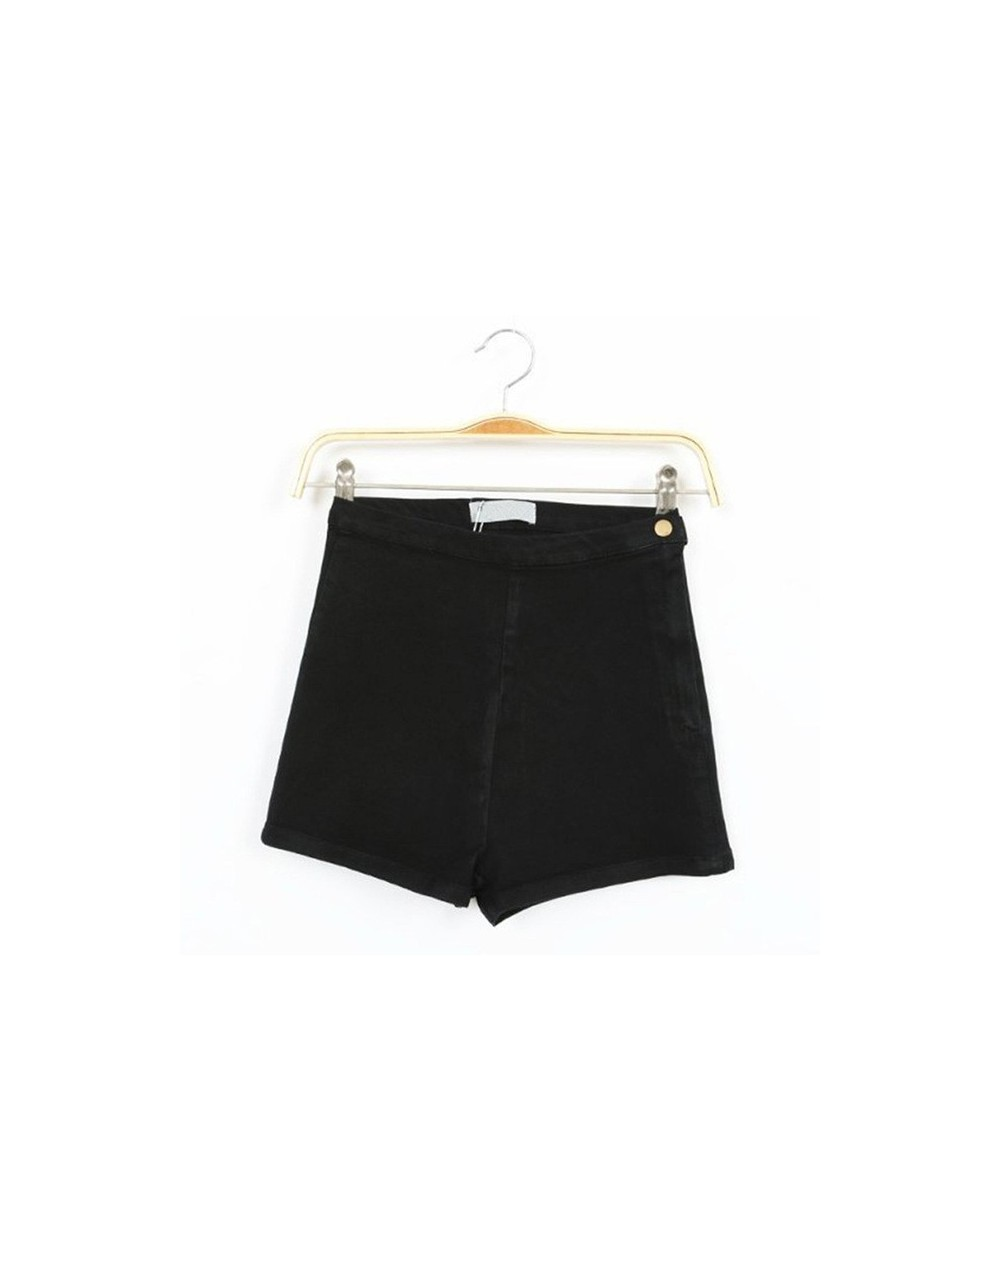 Colorful Apparel New Hot Fashion Solid Side Zipper High Waist Shorts Women/Slim Denim Shorts for Women CA66A - black - 4Y367...